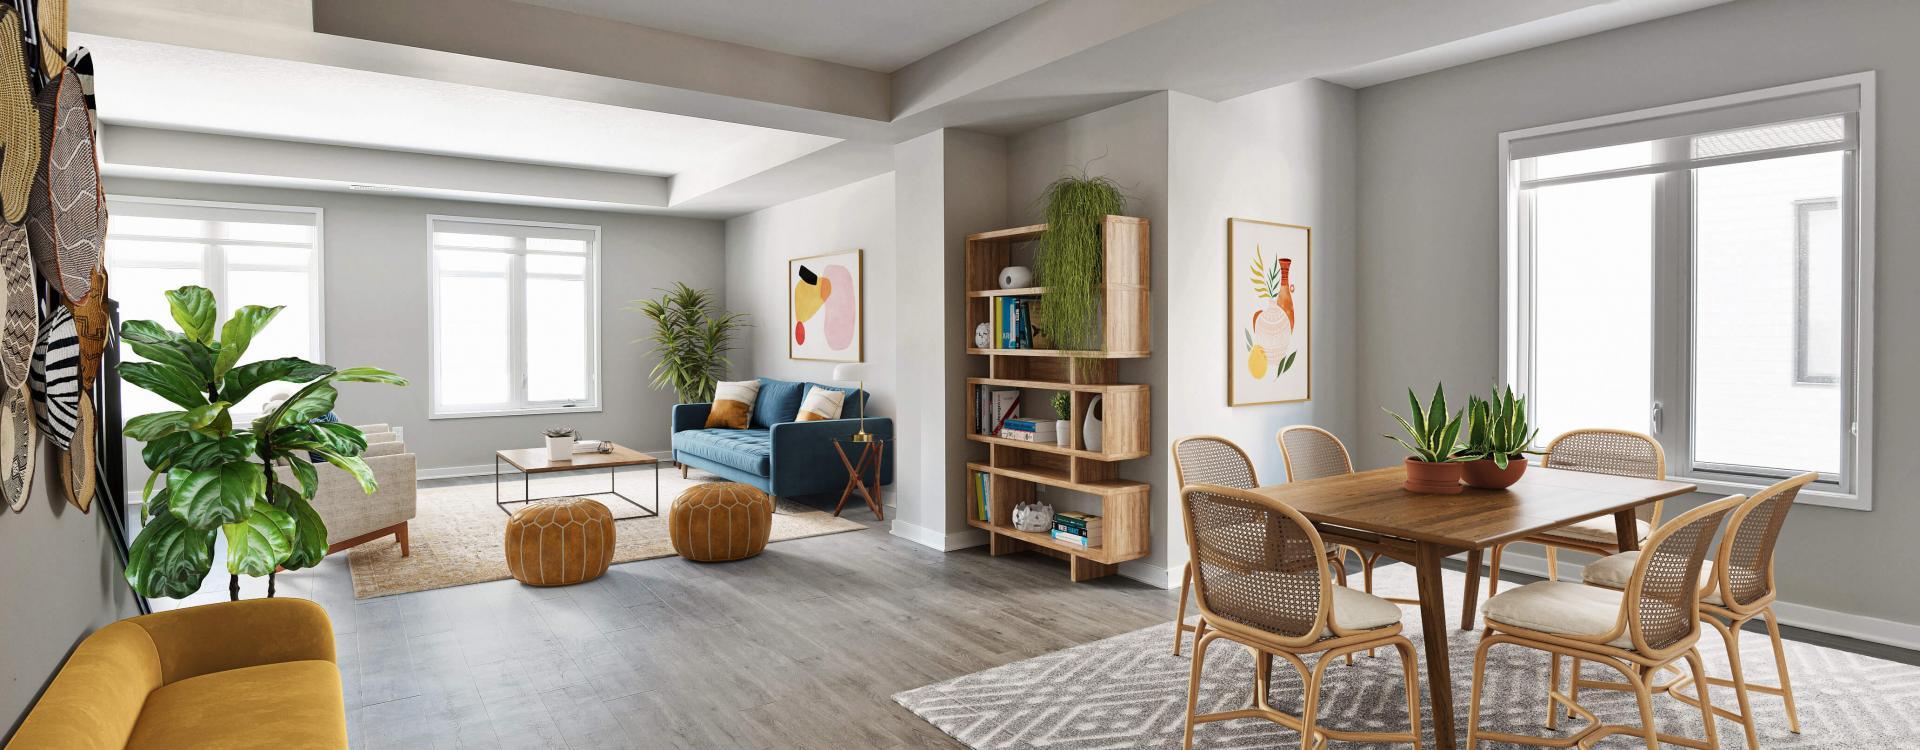 Spacious living room at Navaho Townhomes in Ottawa